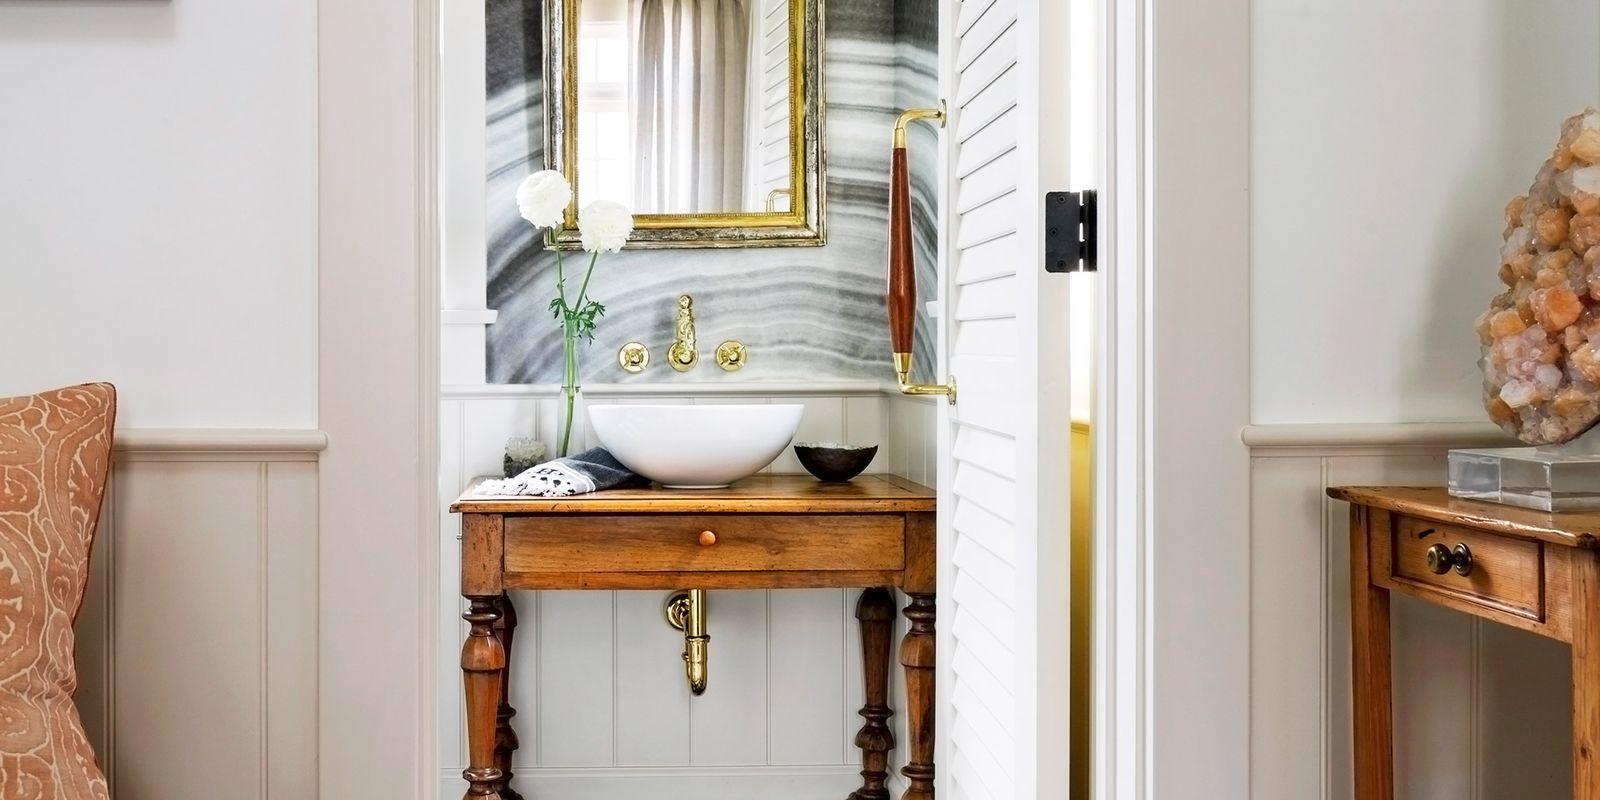 Guest Bath Decorating Ideas: Guest Bathroom Design & Decorating Ideas